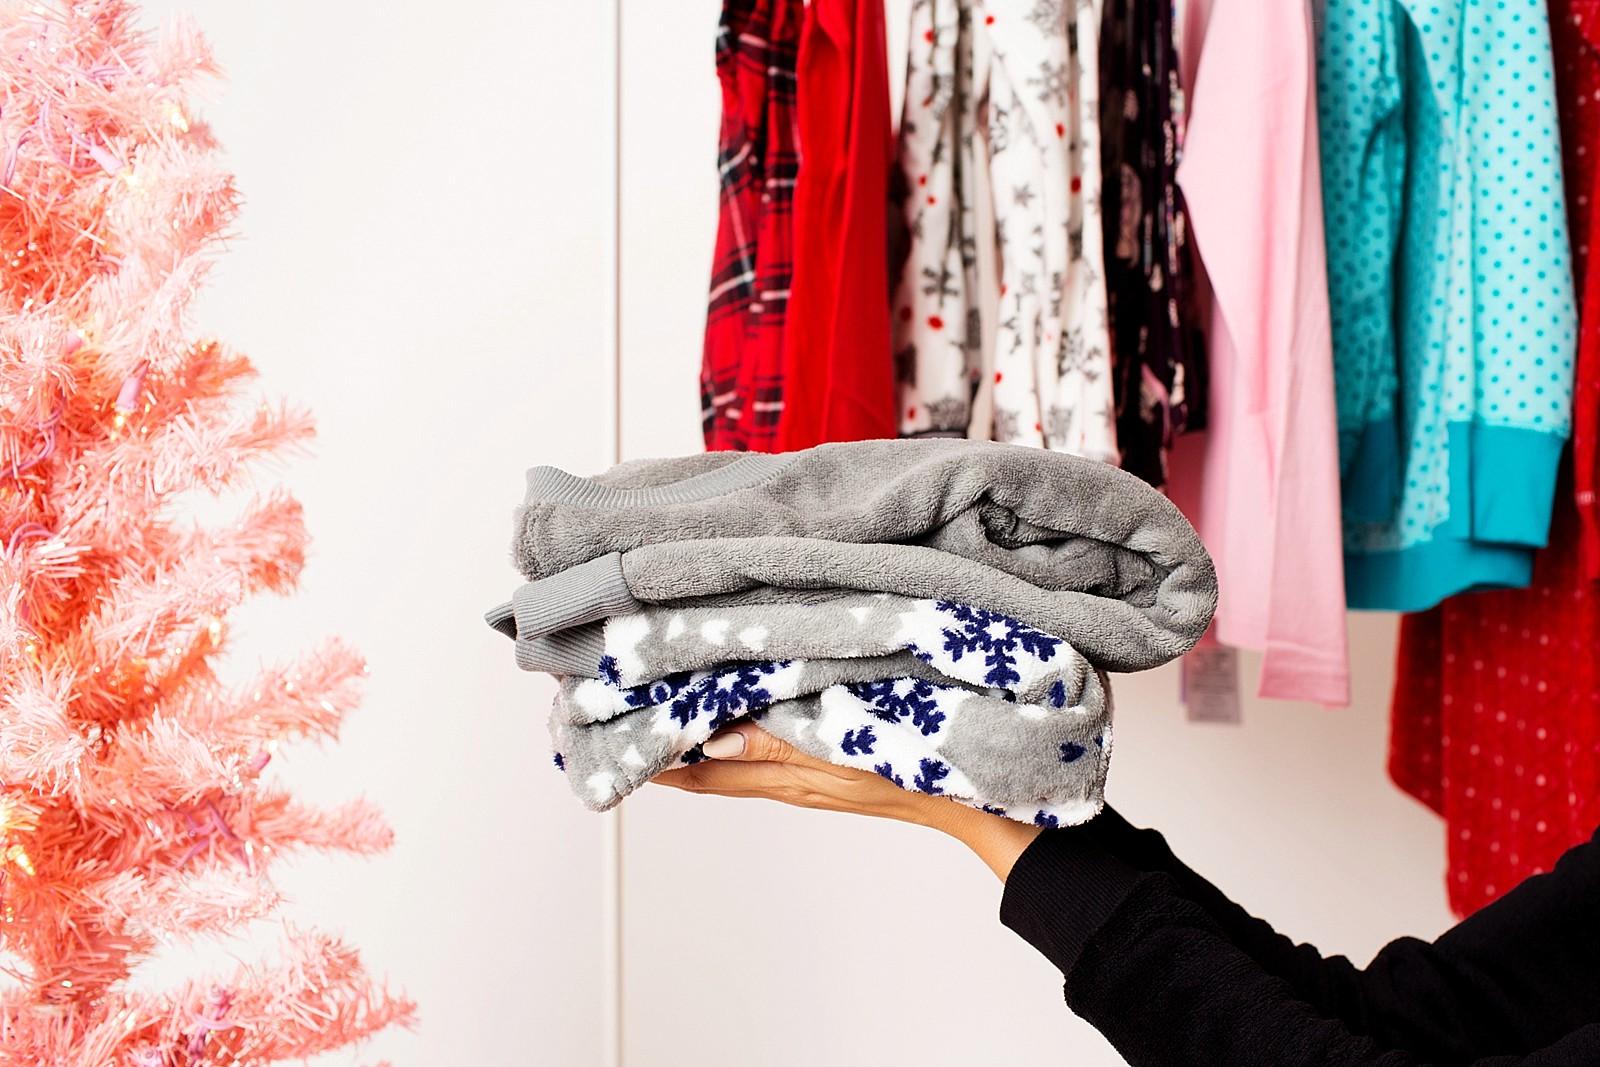 hanes-christmas-pajamas-girls-pajama-party-ideas-cute-jammies-diana-elizabeth-lifestyle-fashion-blogger-phoenix-arizona-1752